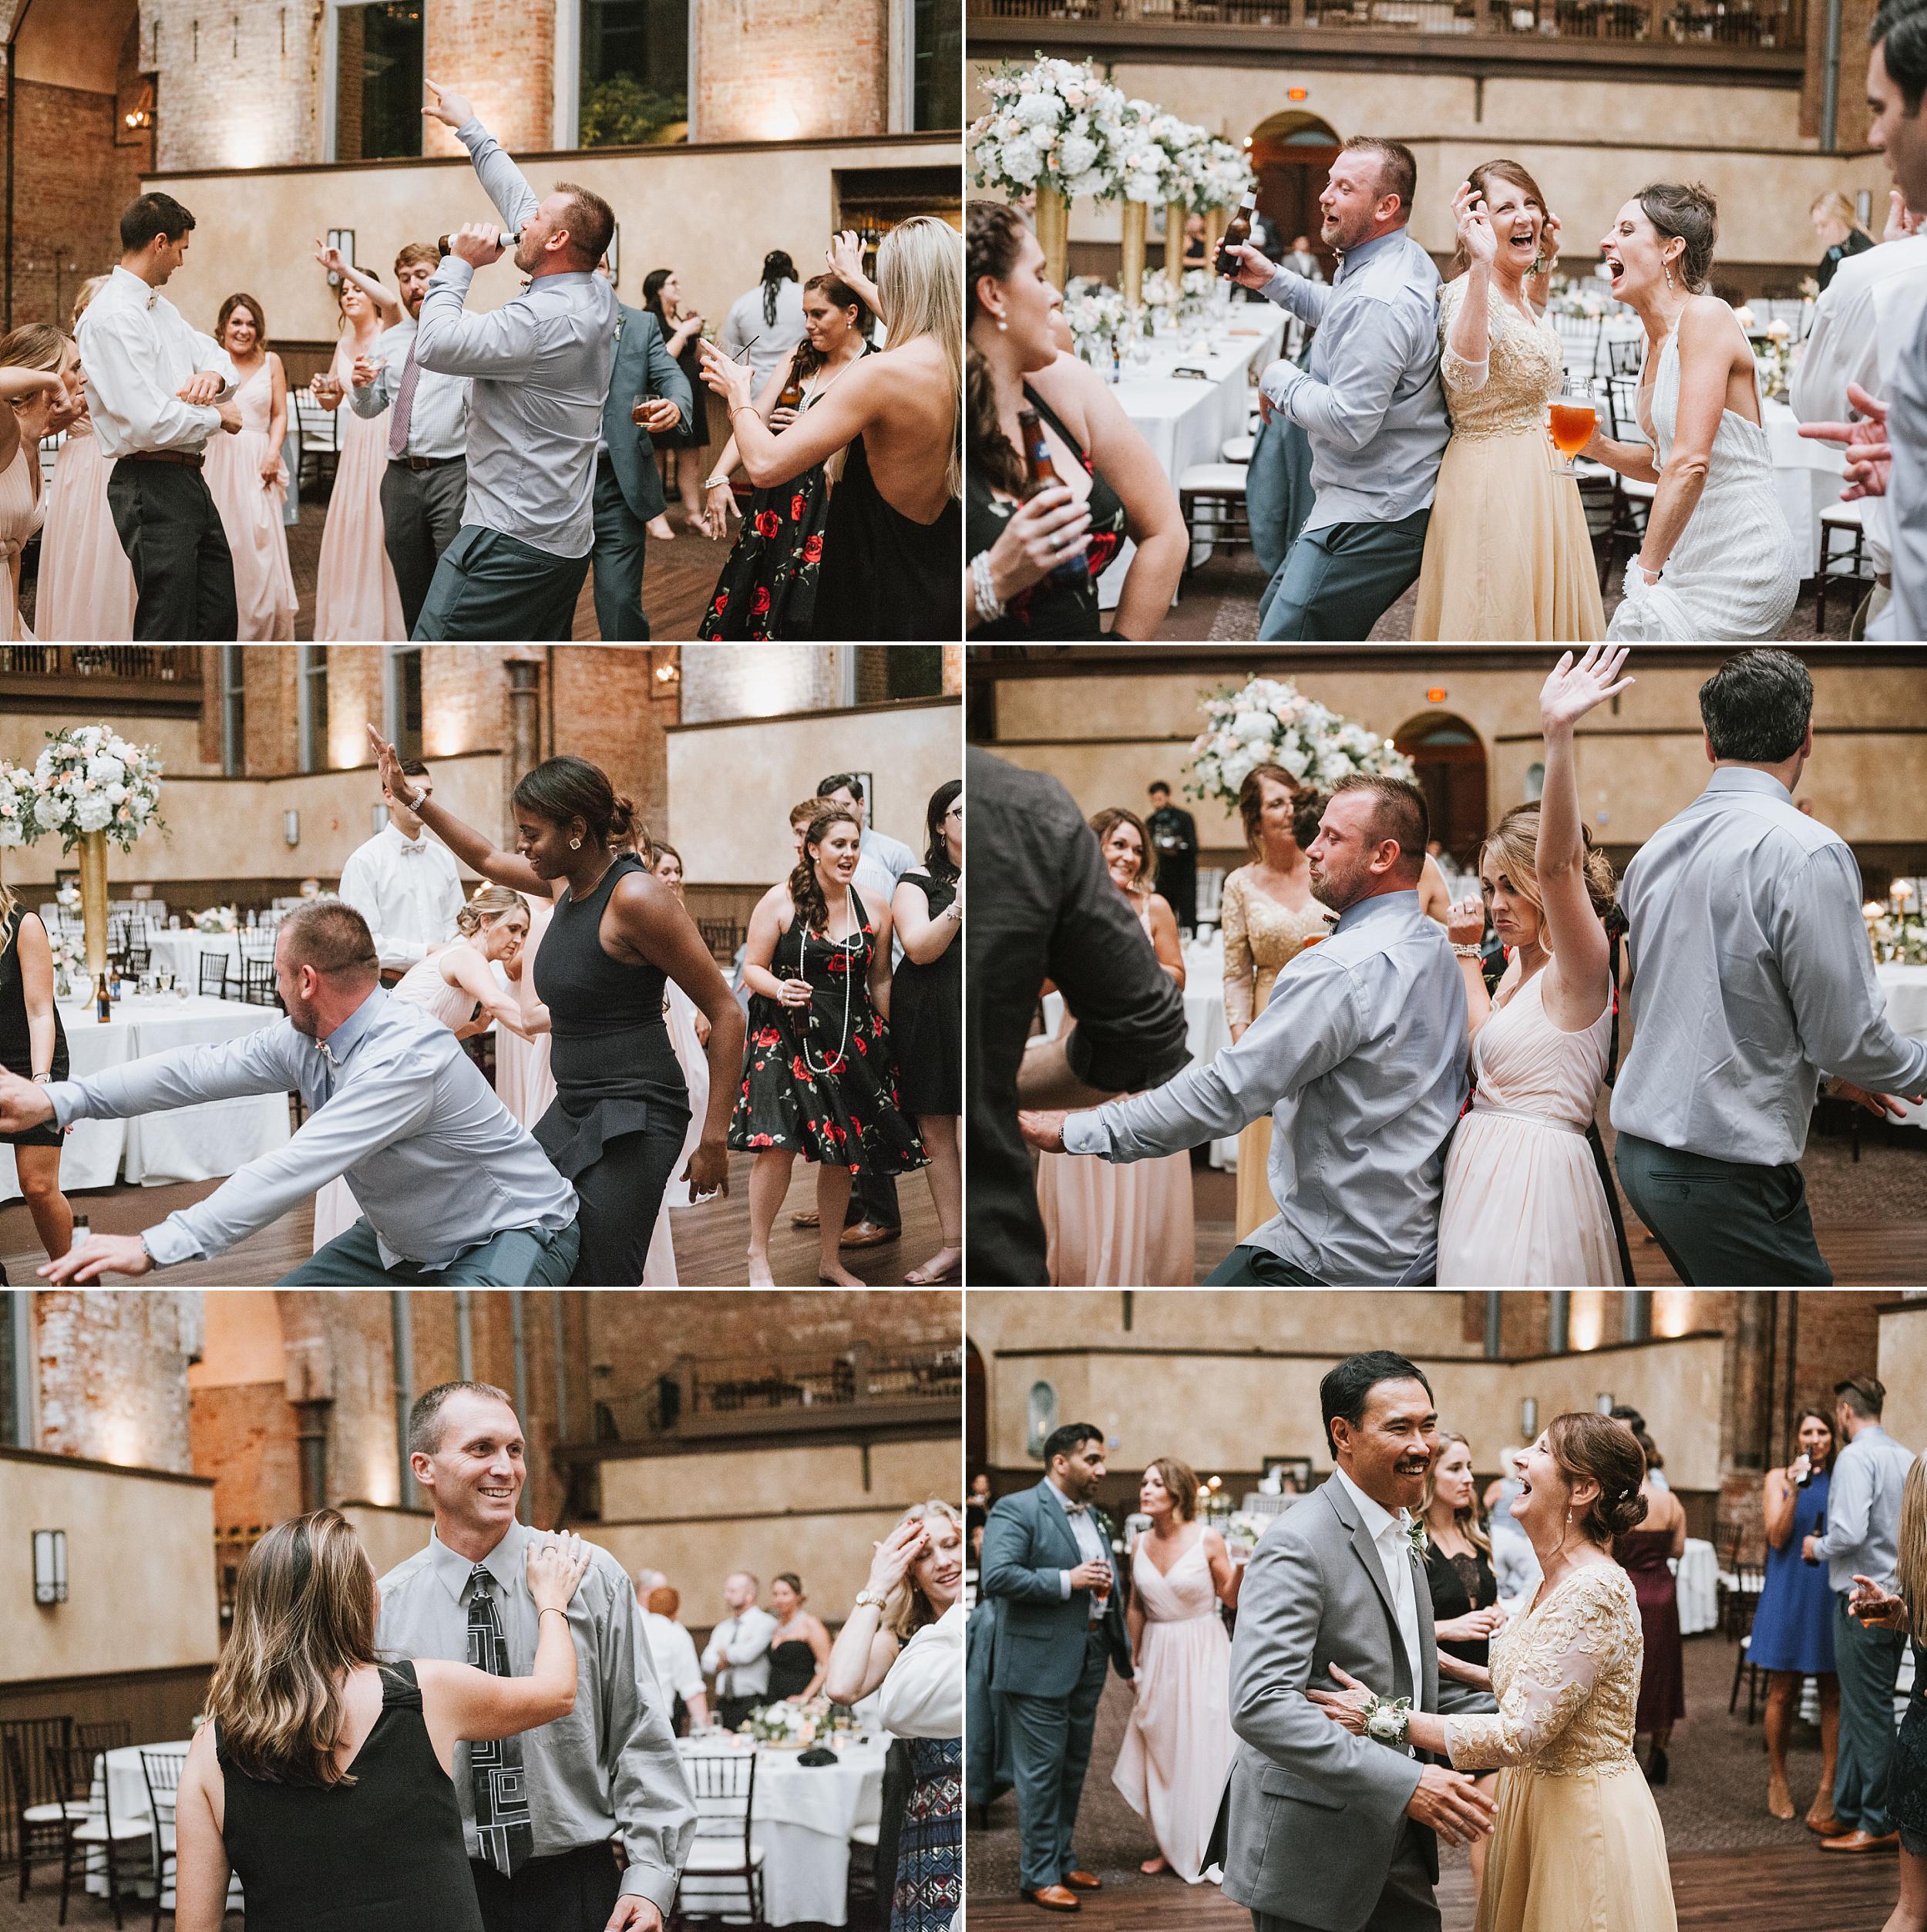 Brooke Townsend Photography - Cincinnati Wedding Photographer (165 of 170).jpg